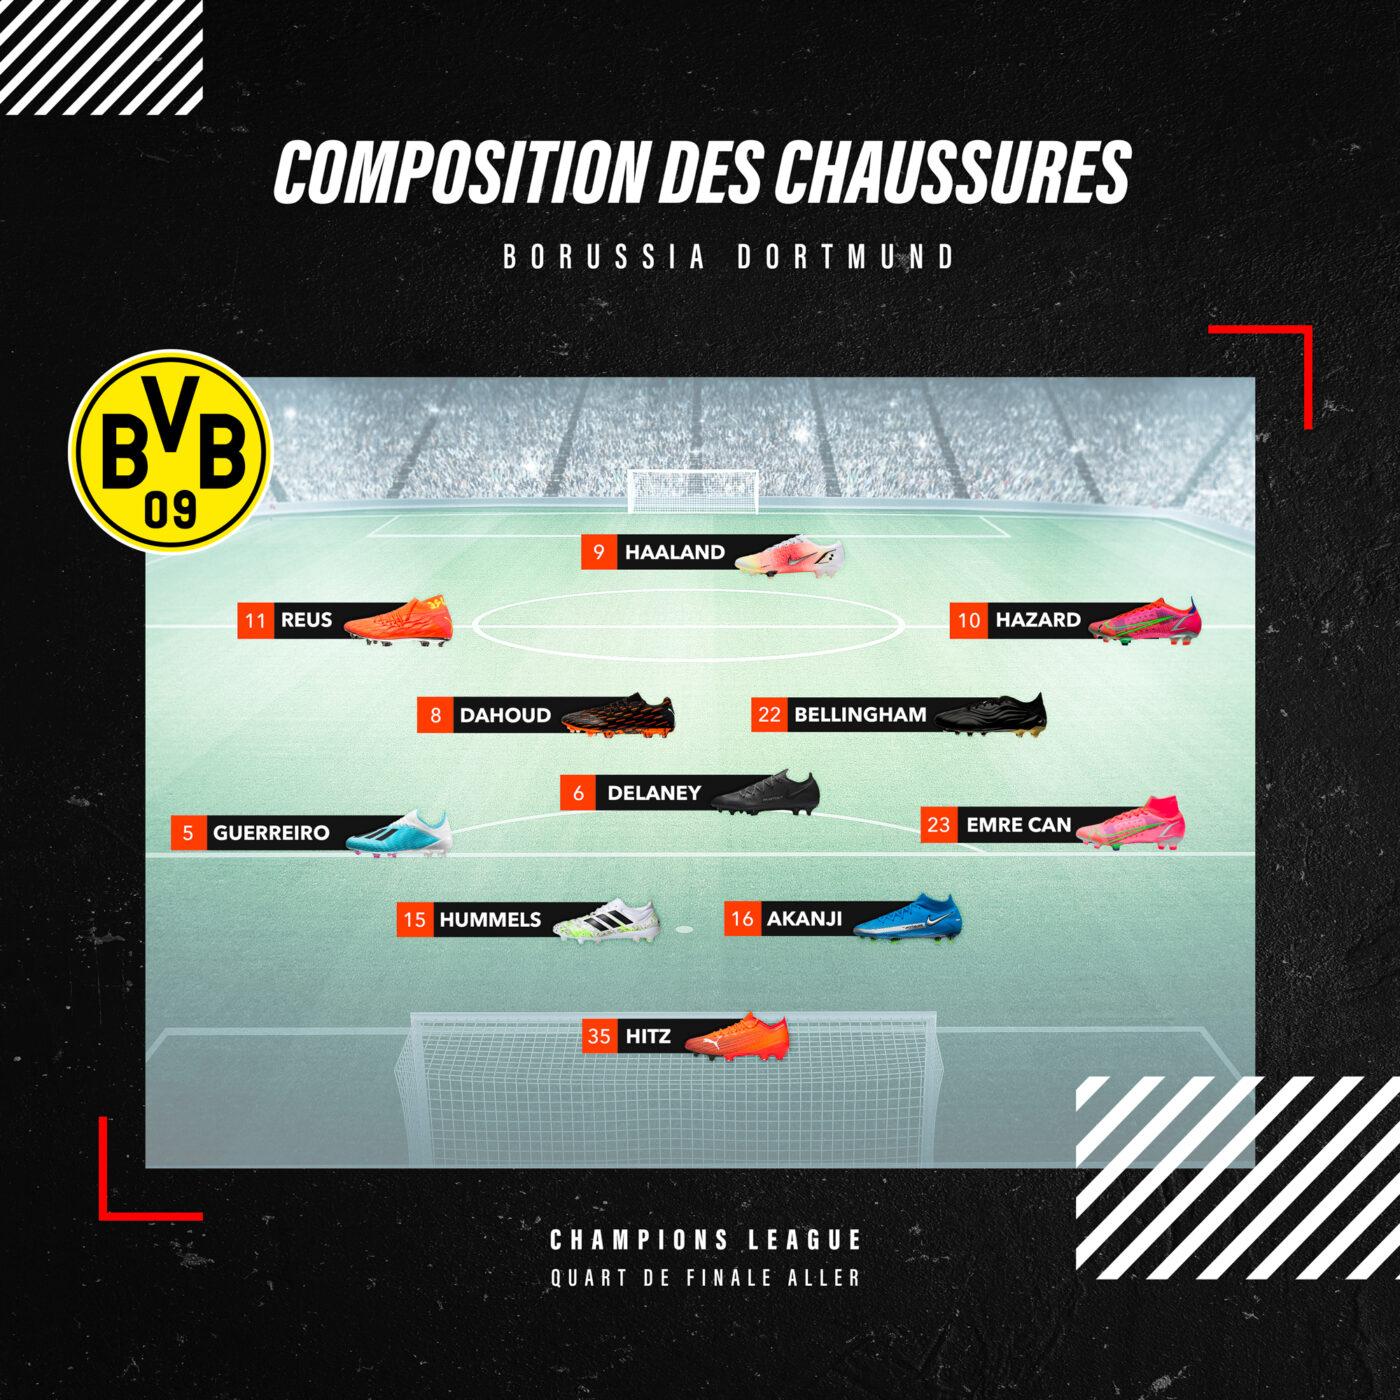 Compo Dortmund Champions League